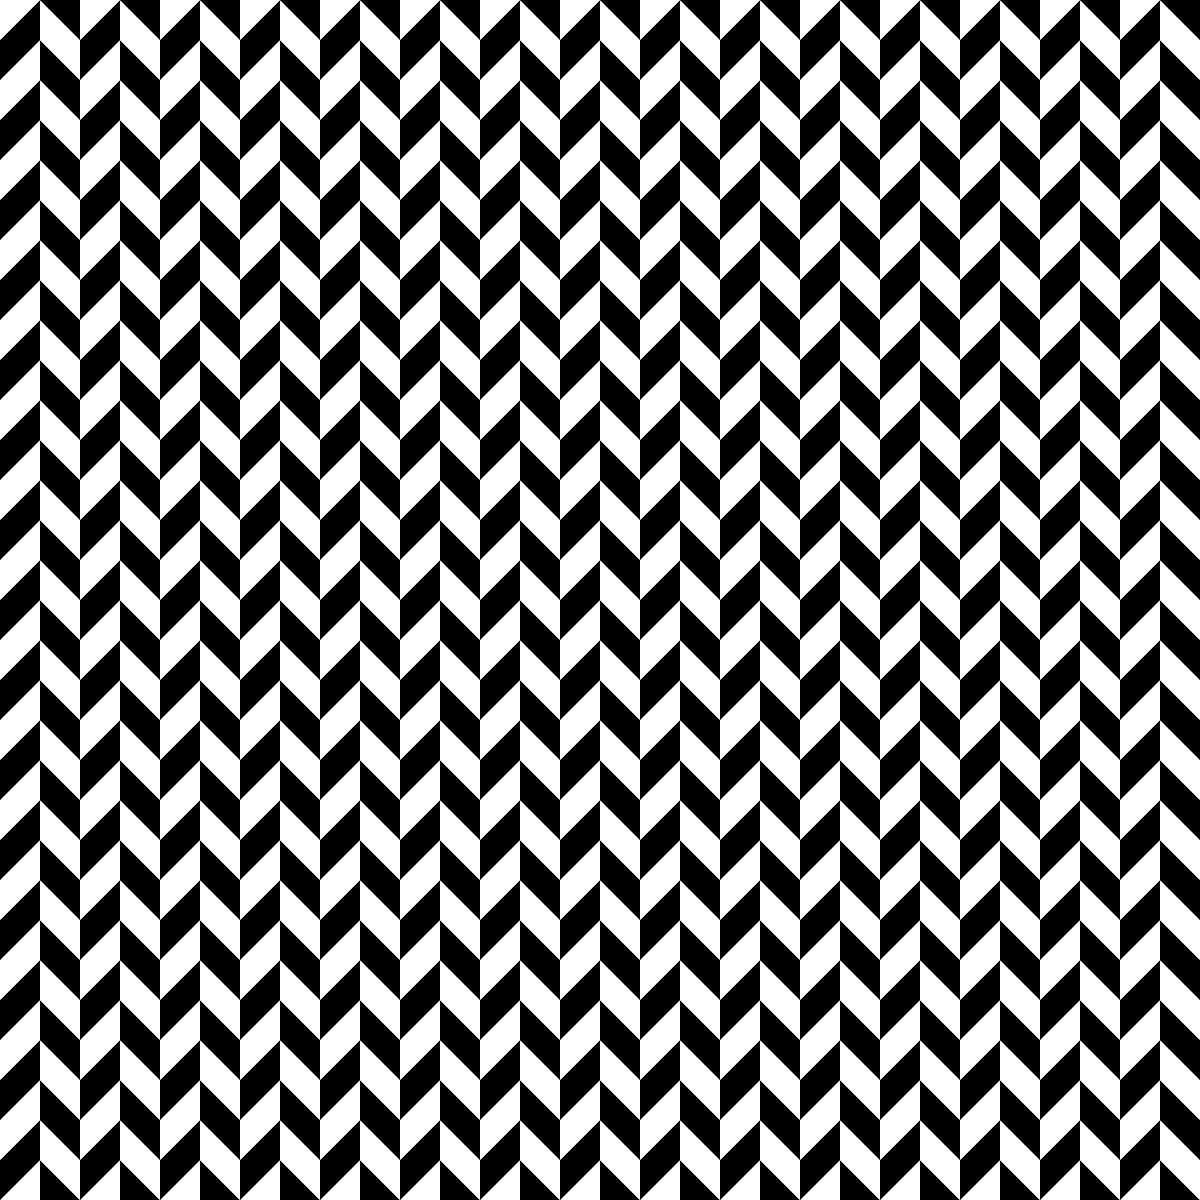 chevron pattern svg - HD1200×1200